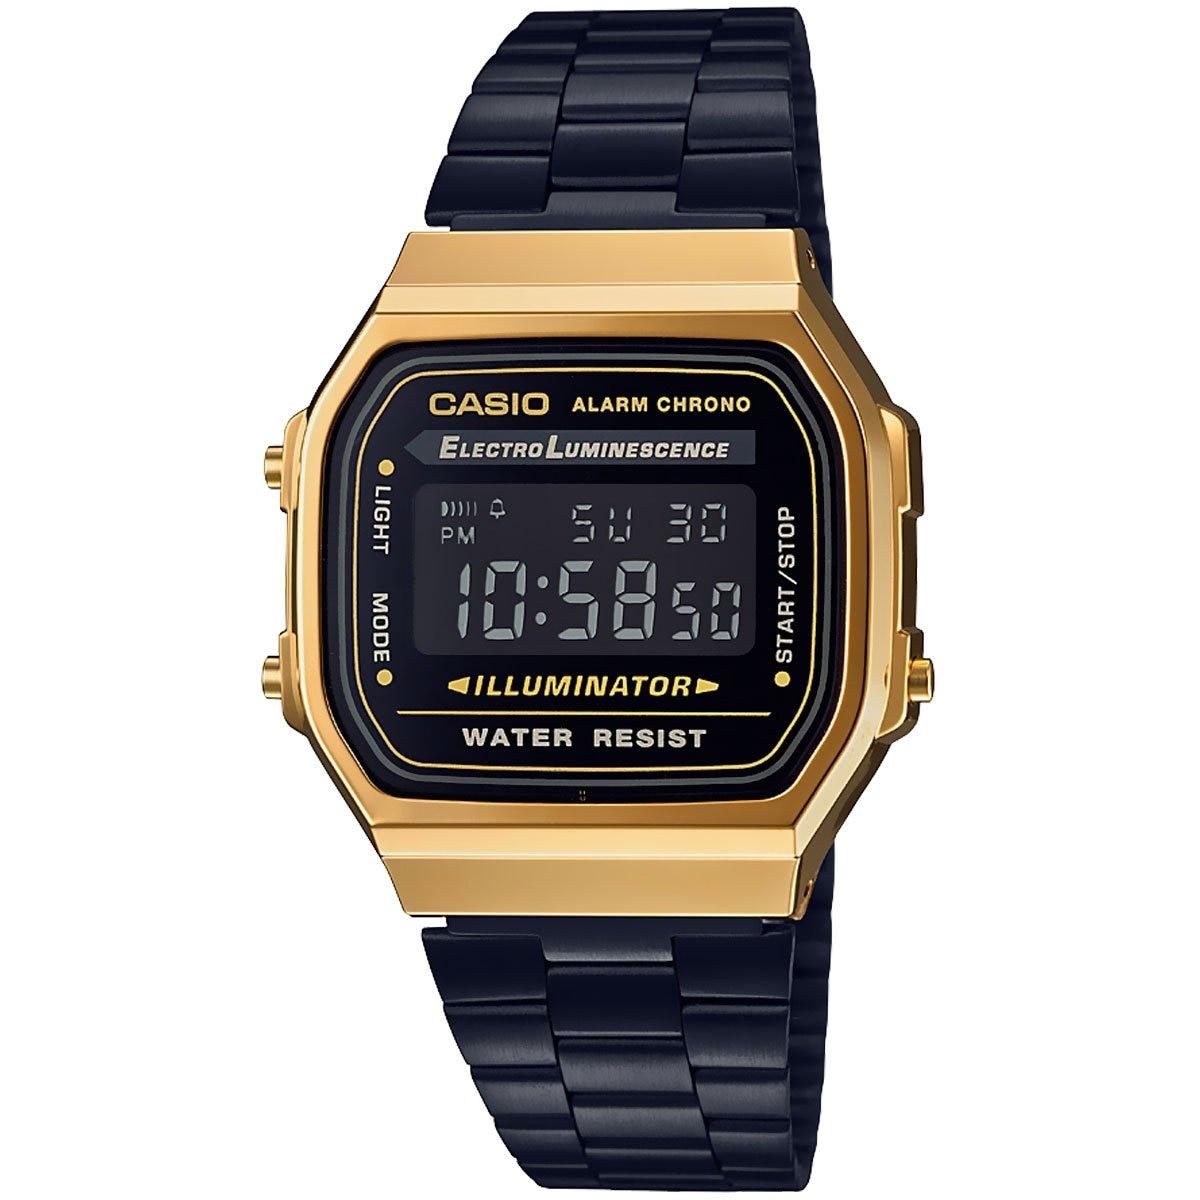 Reloj Unisex Vintage Casio A168Wegb-1Bvt